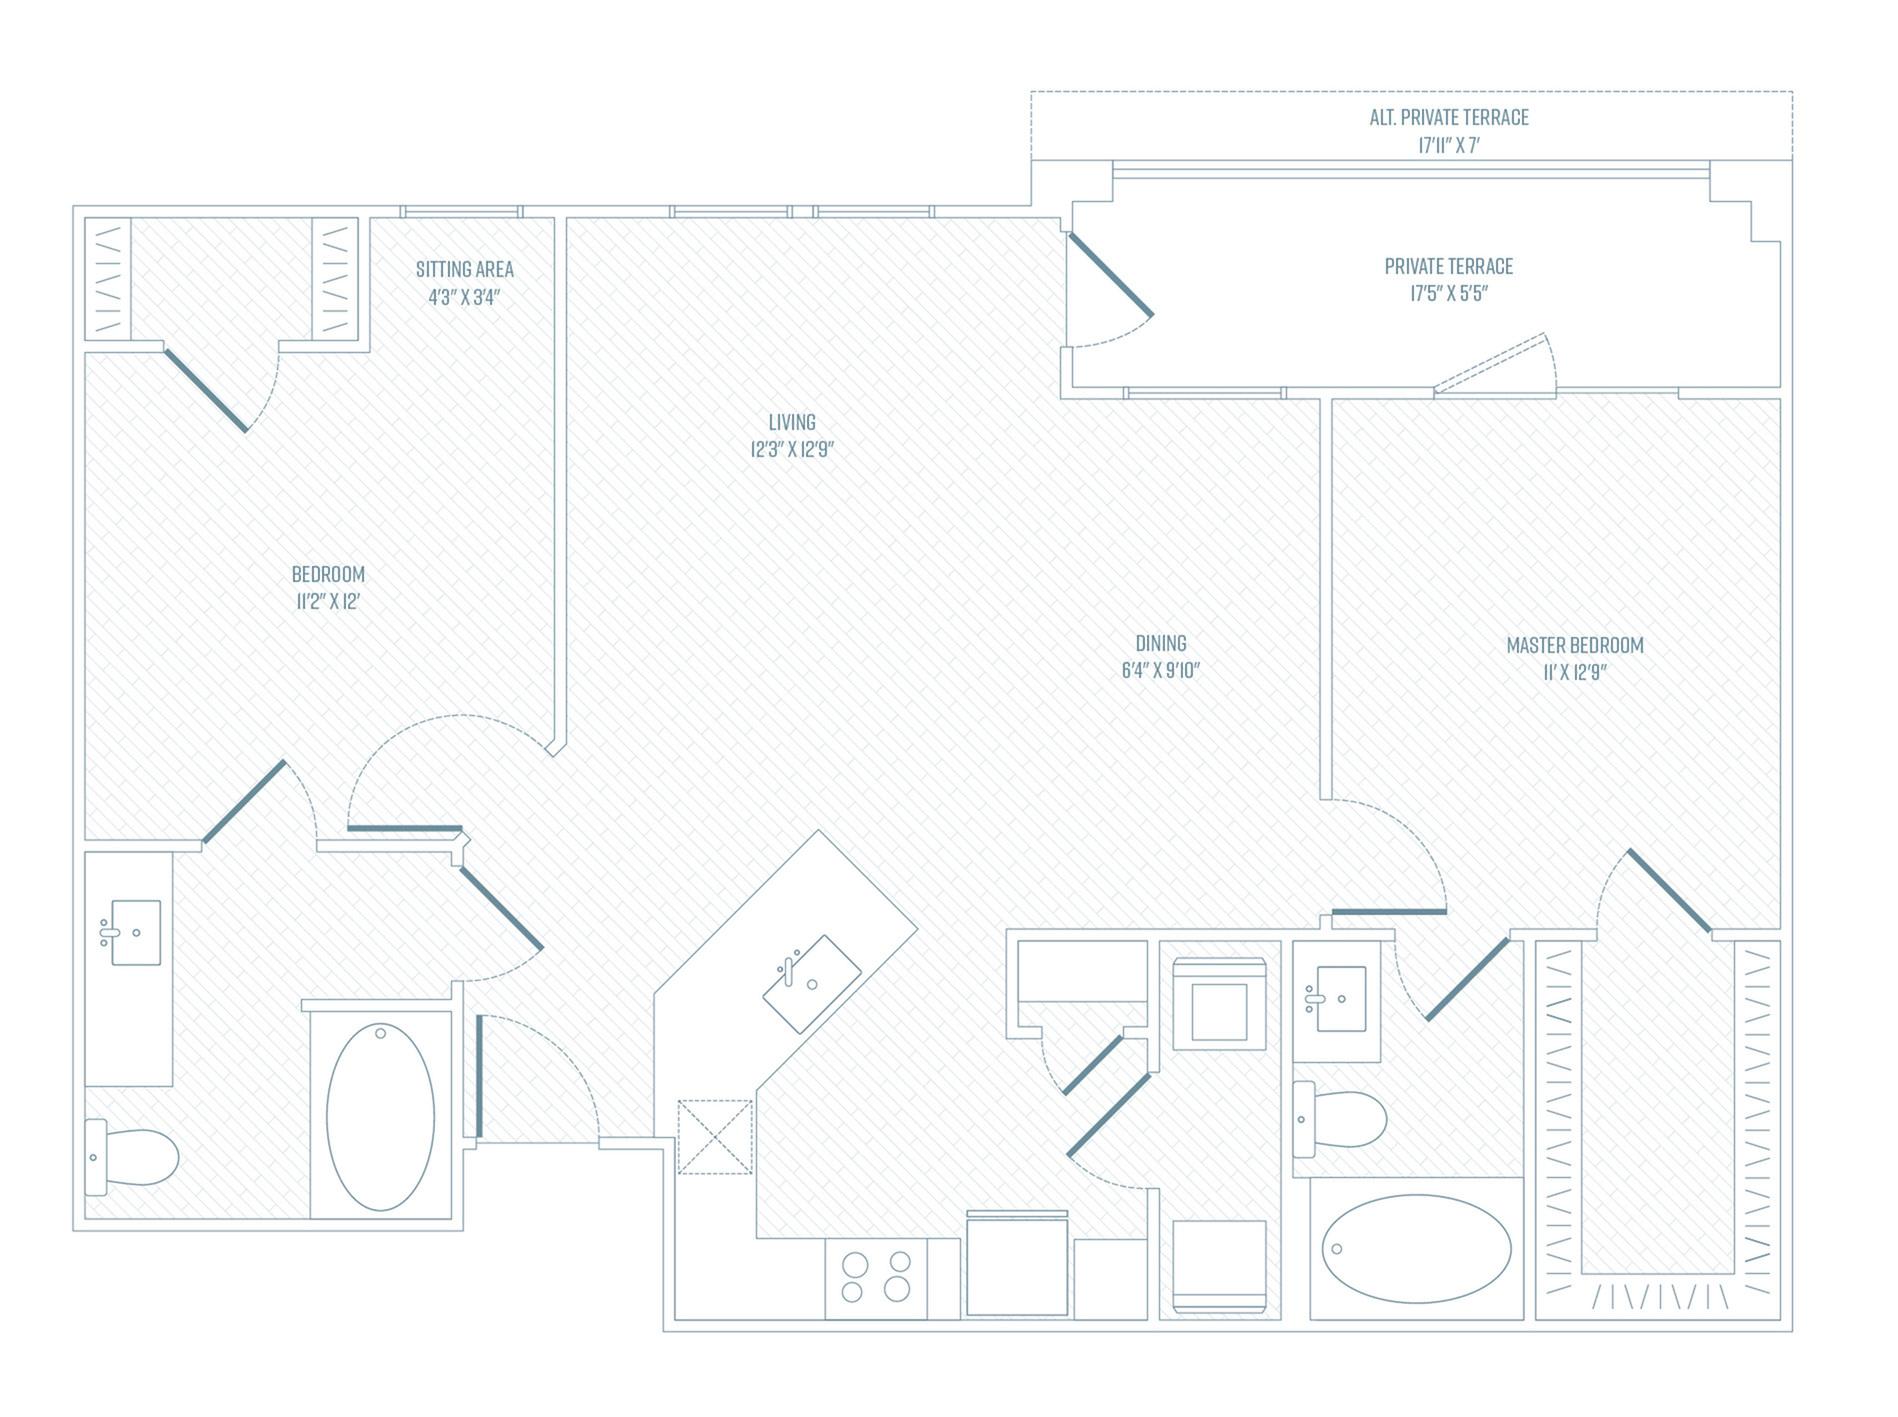 2 Bedroom Floor Plan | Apartments In Farmers Branch TX | Luxe at Mercer Crossing